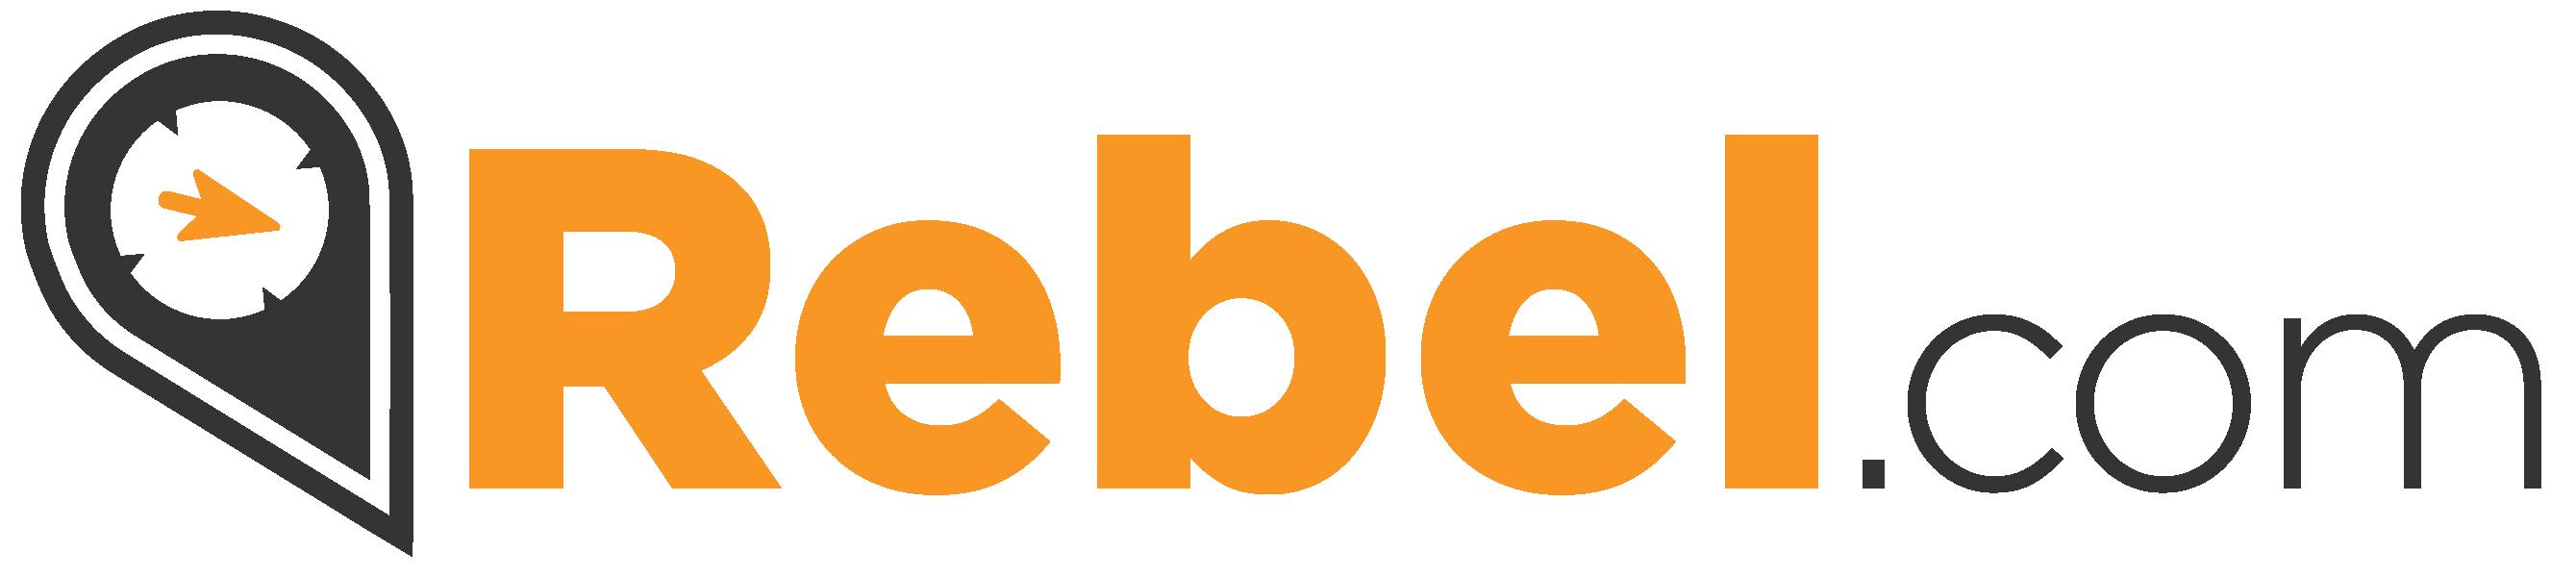 rebel-canada-logo